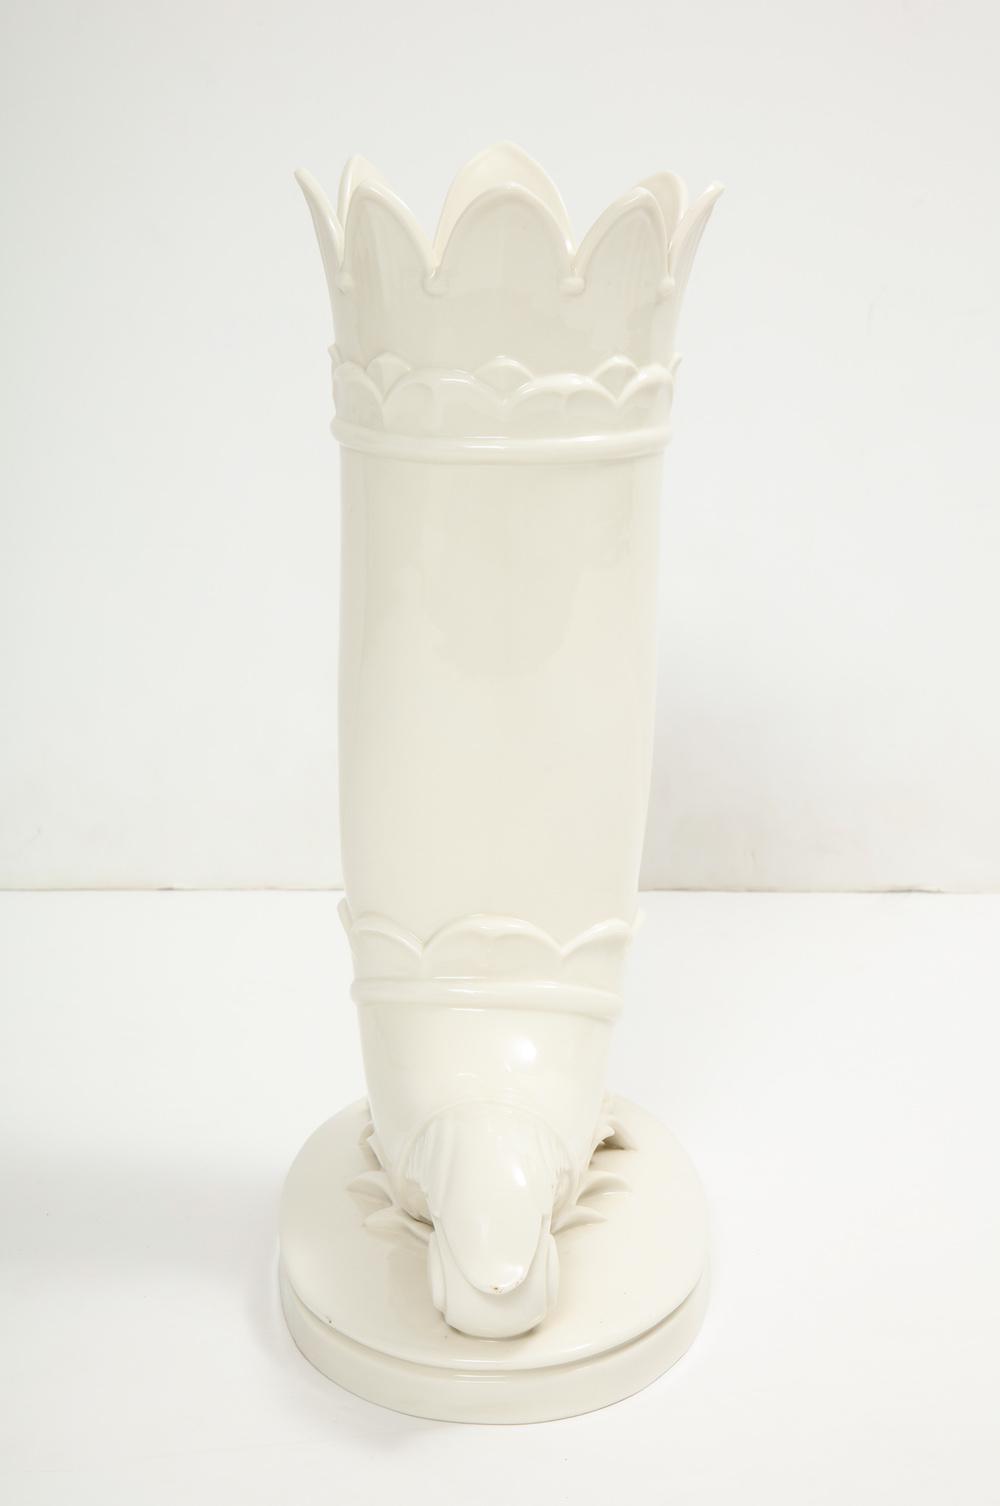 German Porcelain Horn 6R1A8596.jpg